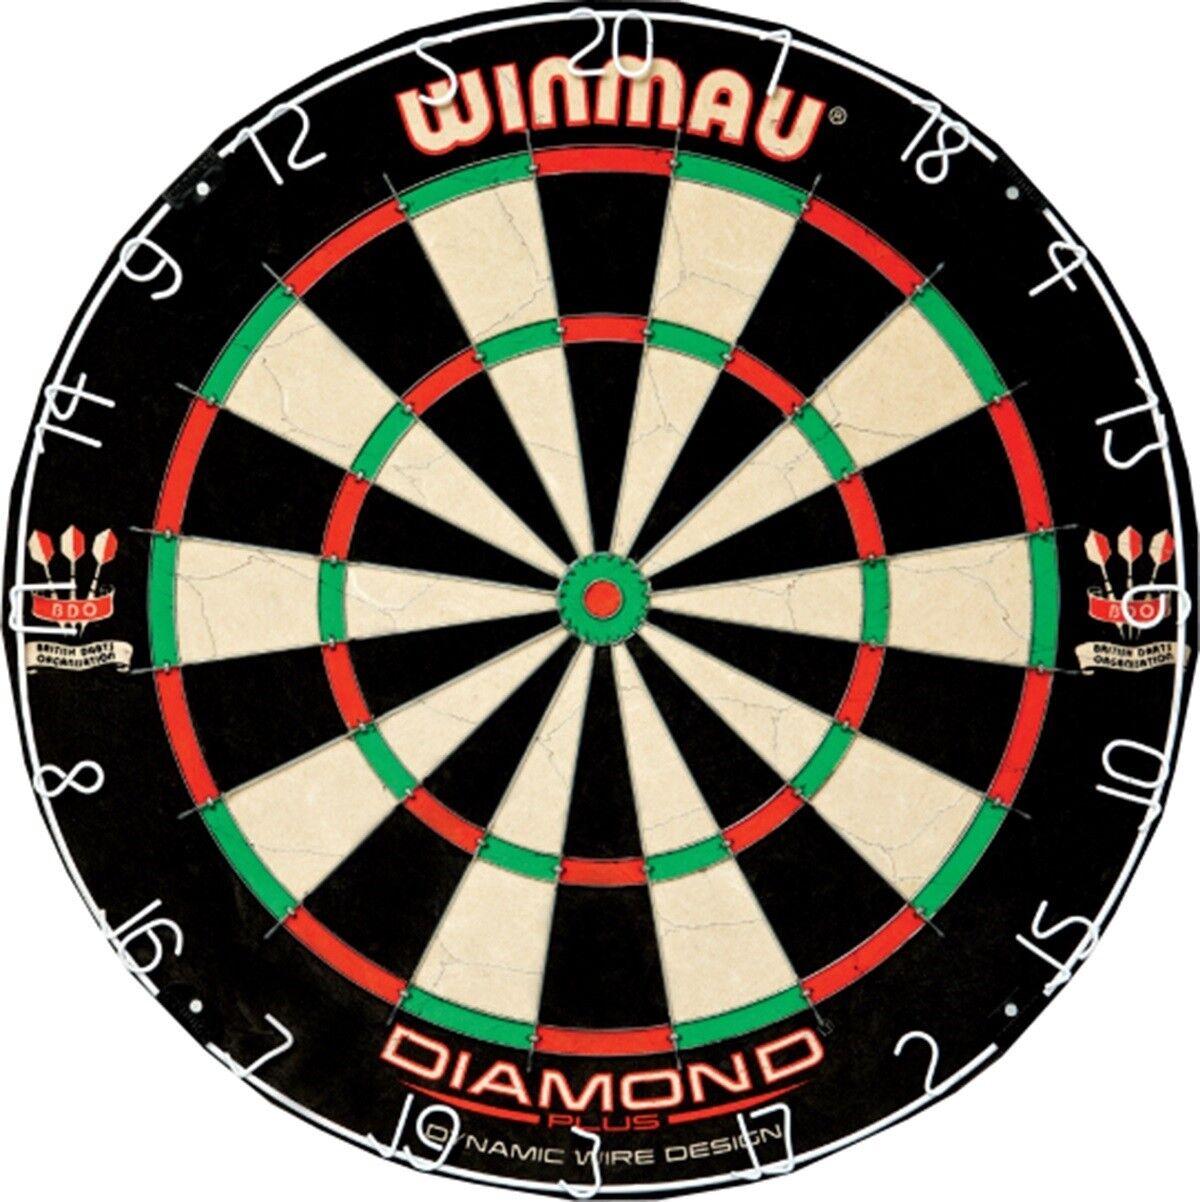 Winmau Diamond Plus Tournant Quality Full Storlek Dart Board